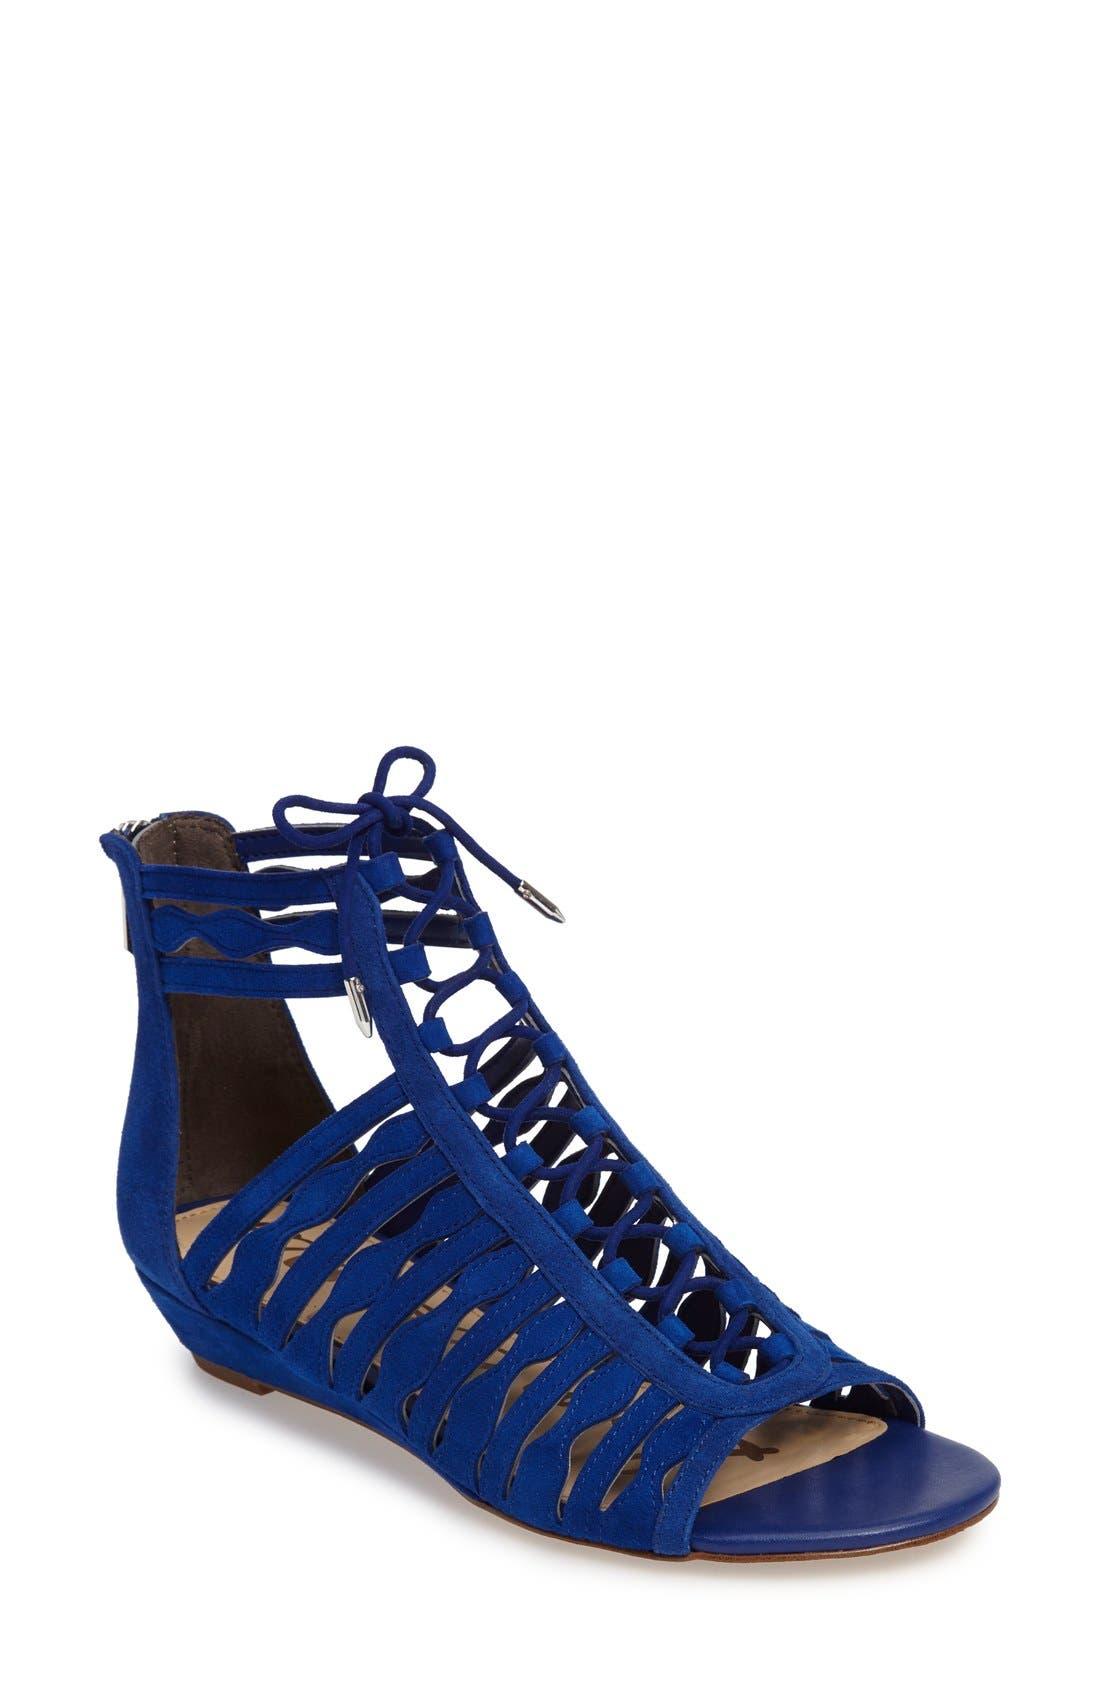 Main Image - Sam Edelman Daleece Lace-Up Sandal (Women)